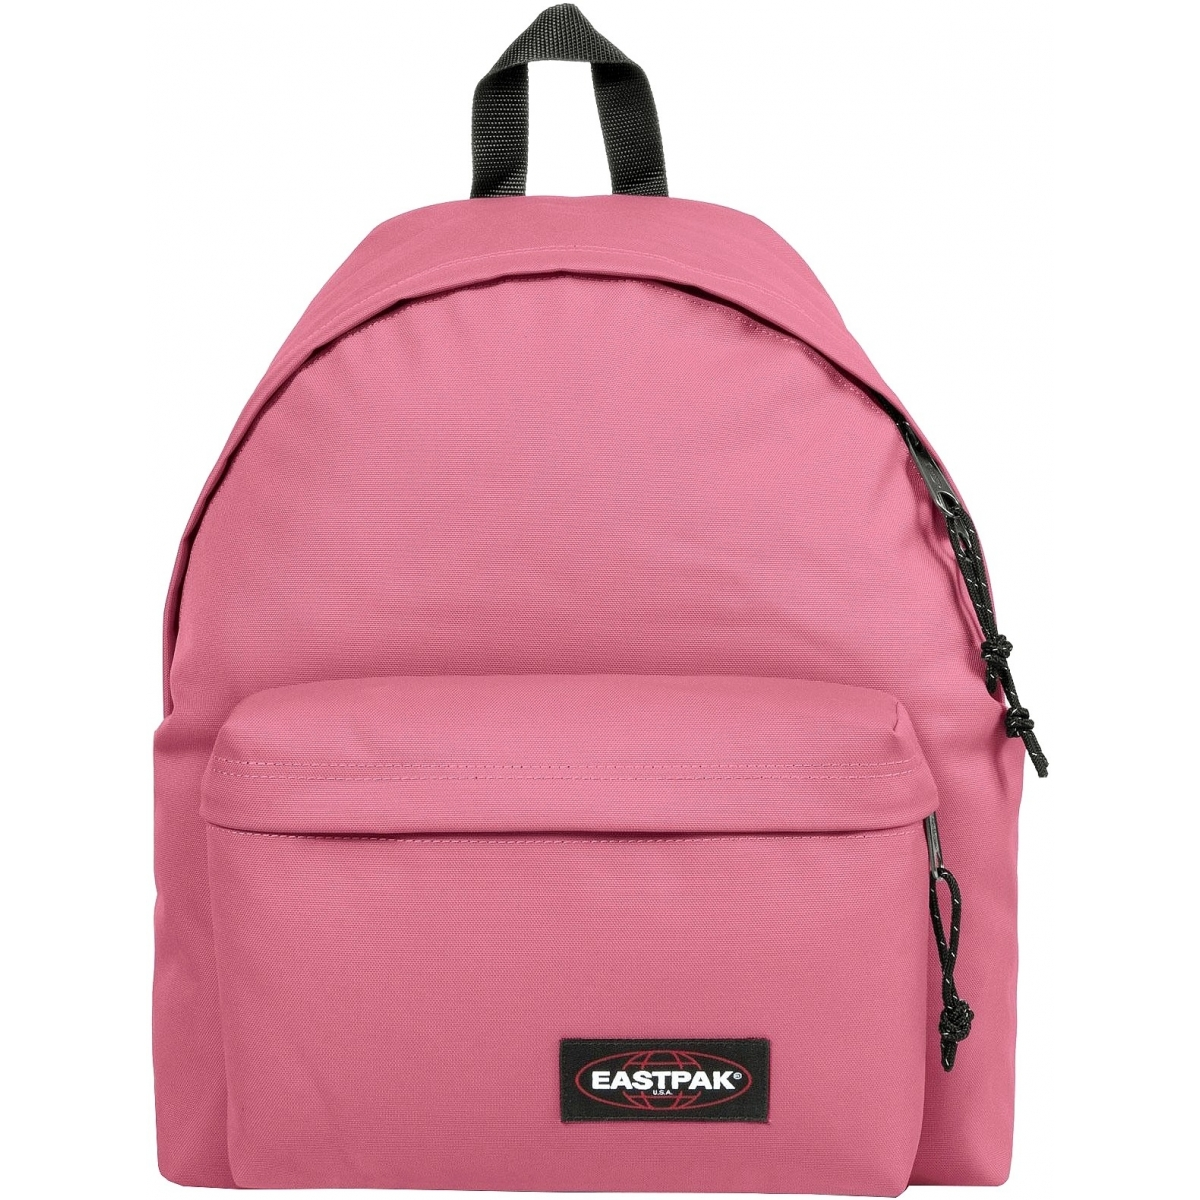 sac eastpak pas cher pink